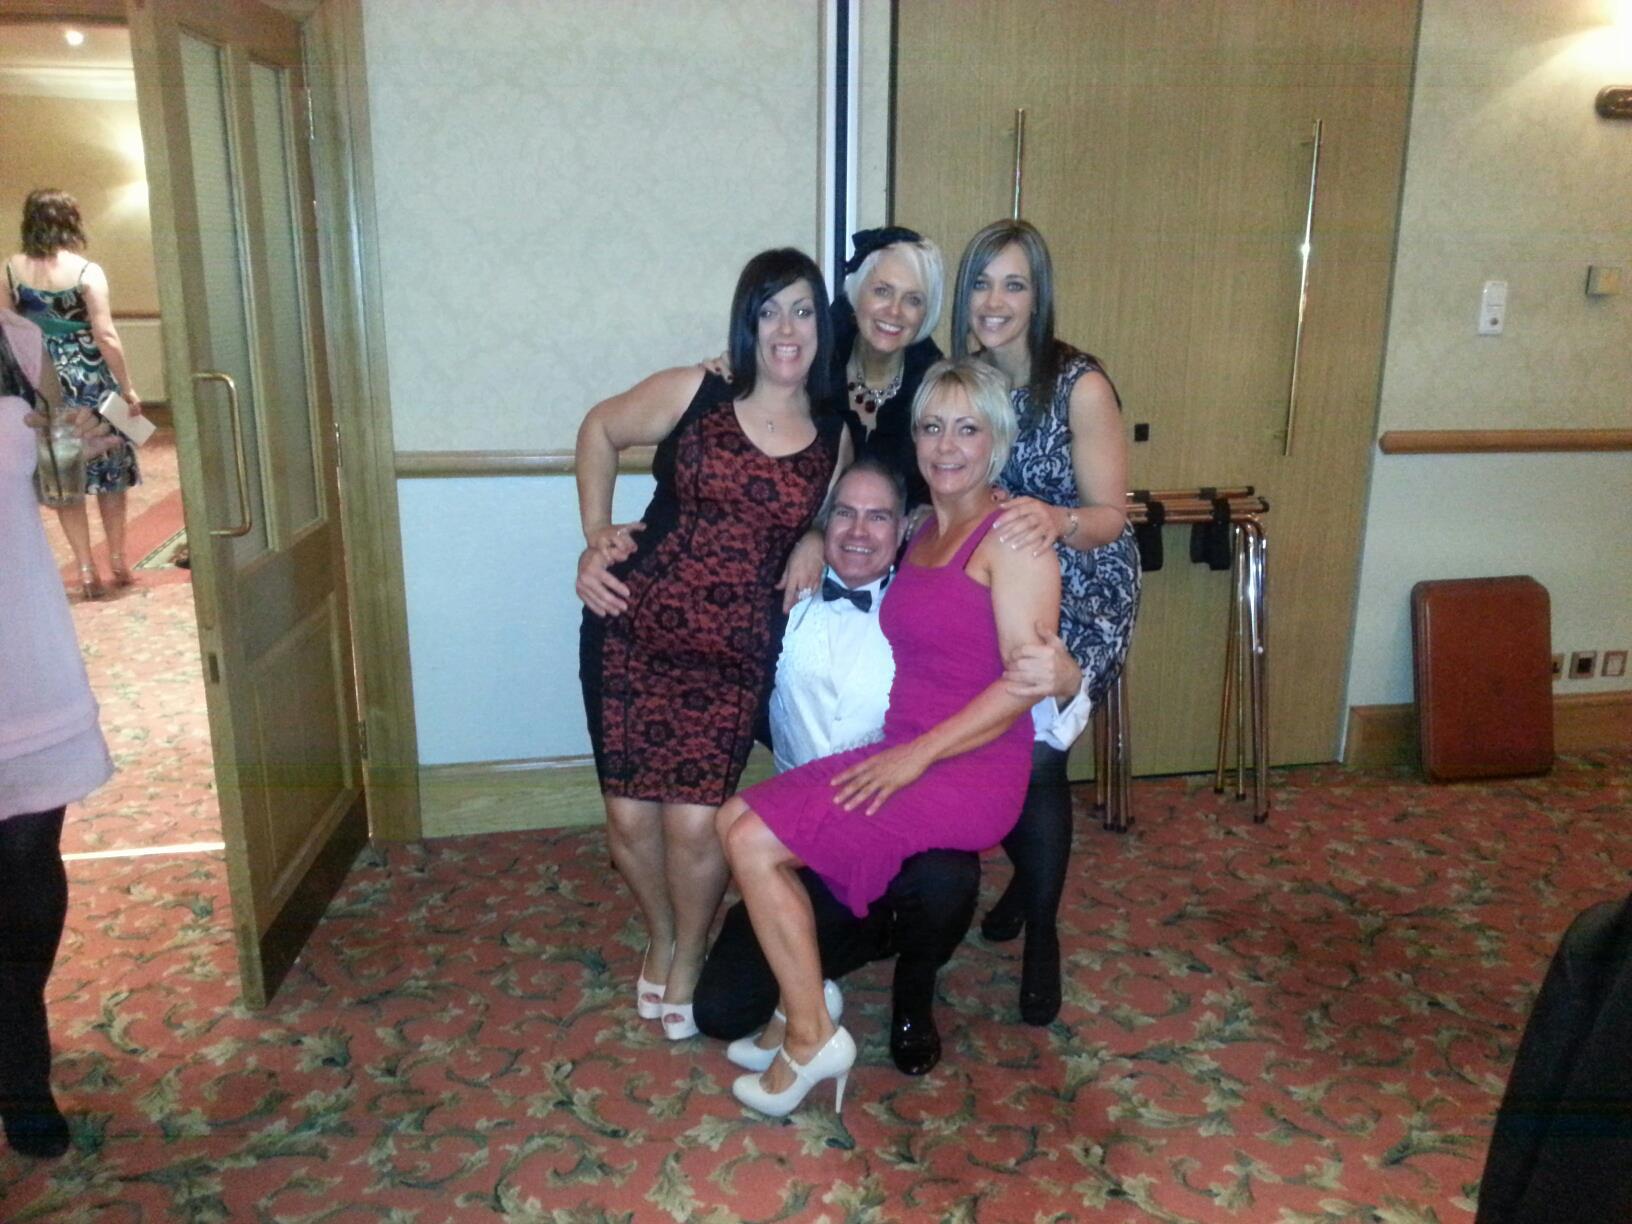 Duncan & the Girls